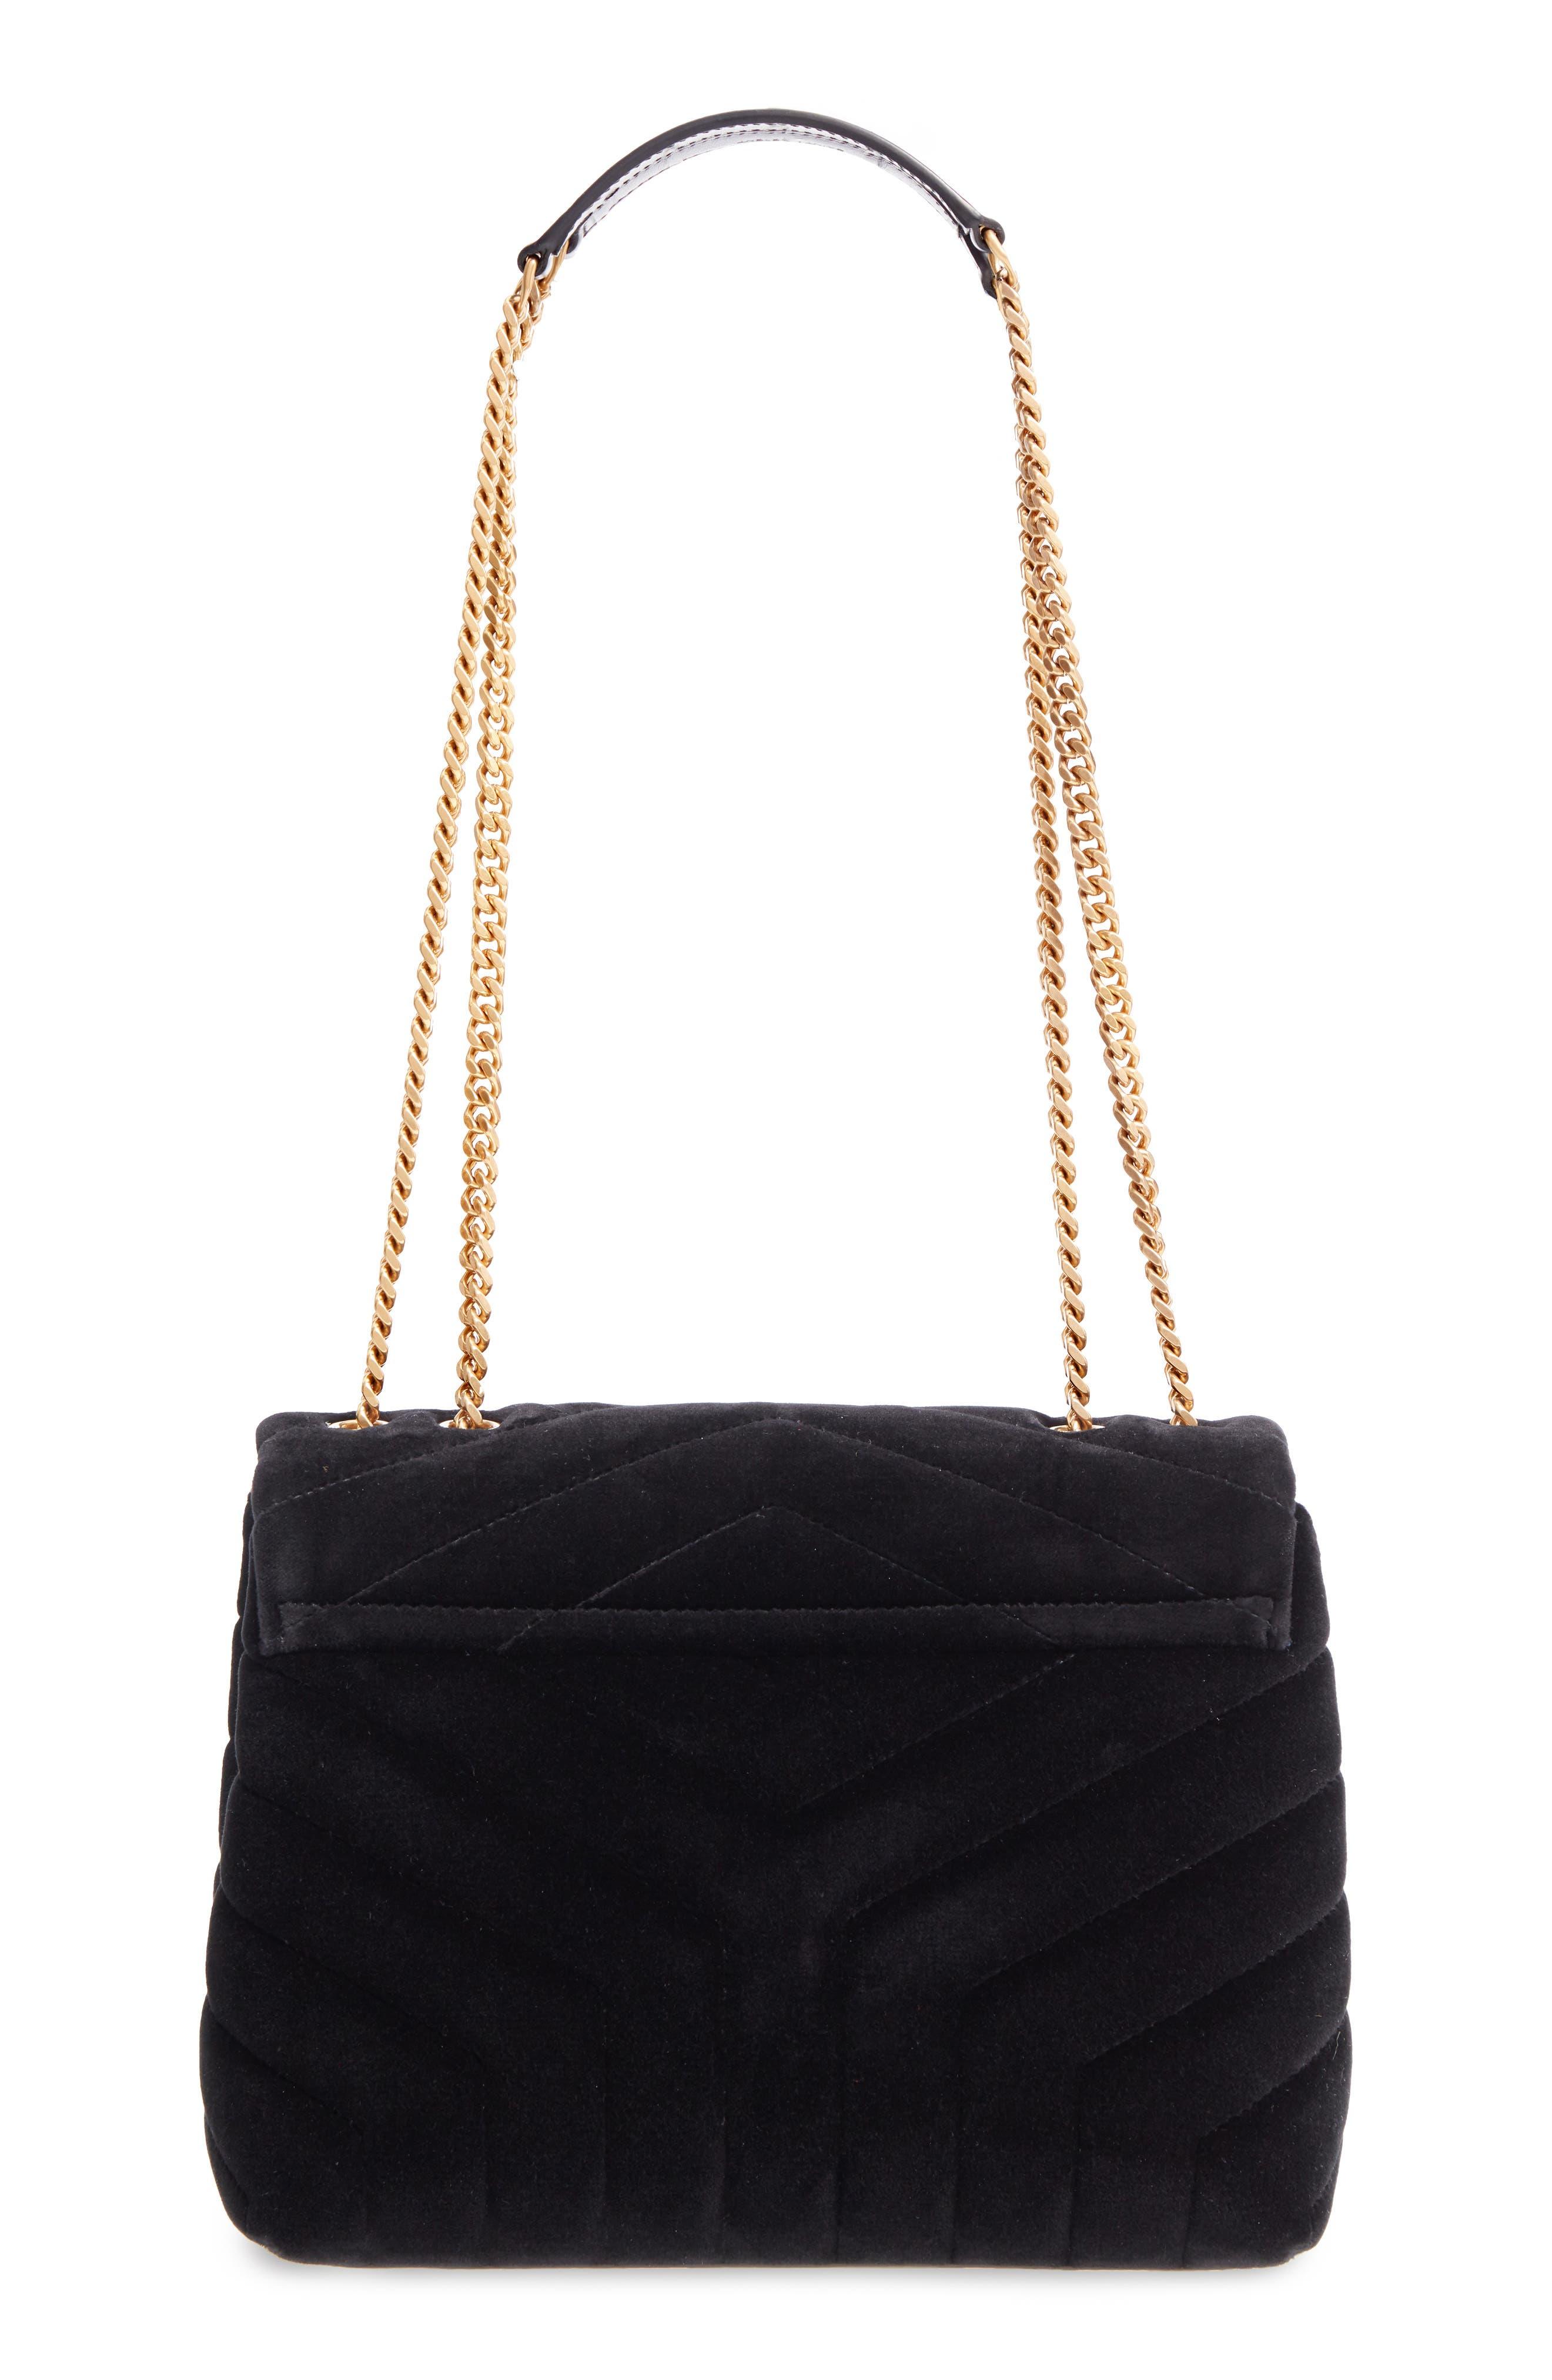 SAINT LAURENT,                             Small Loulou Velvet Shoulder Bag,                             Alternate thumbnail 3, color,                             NERO/ NERO/ NERO